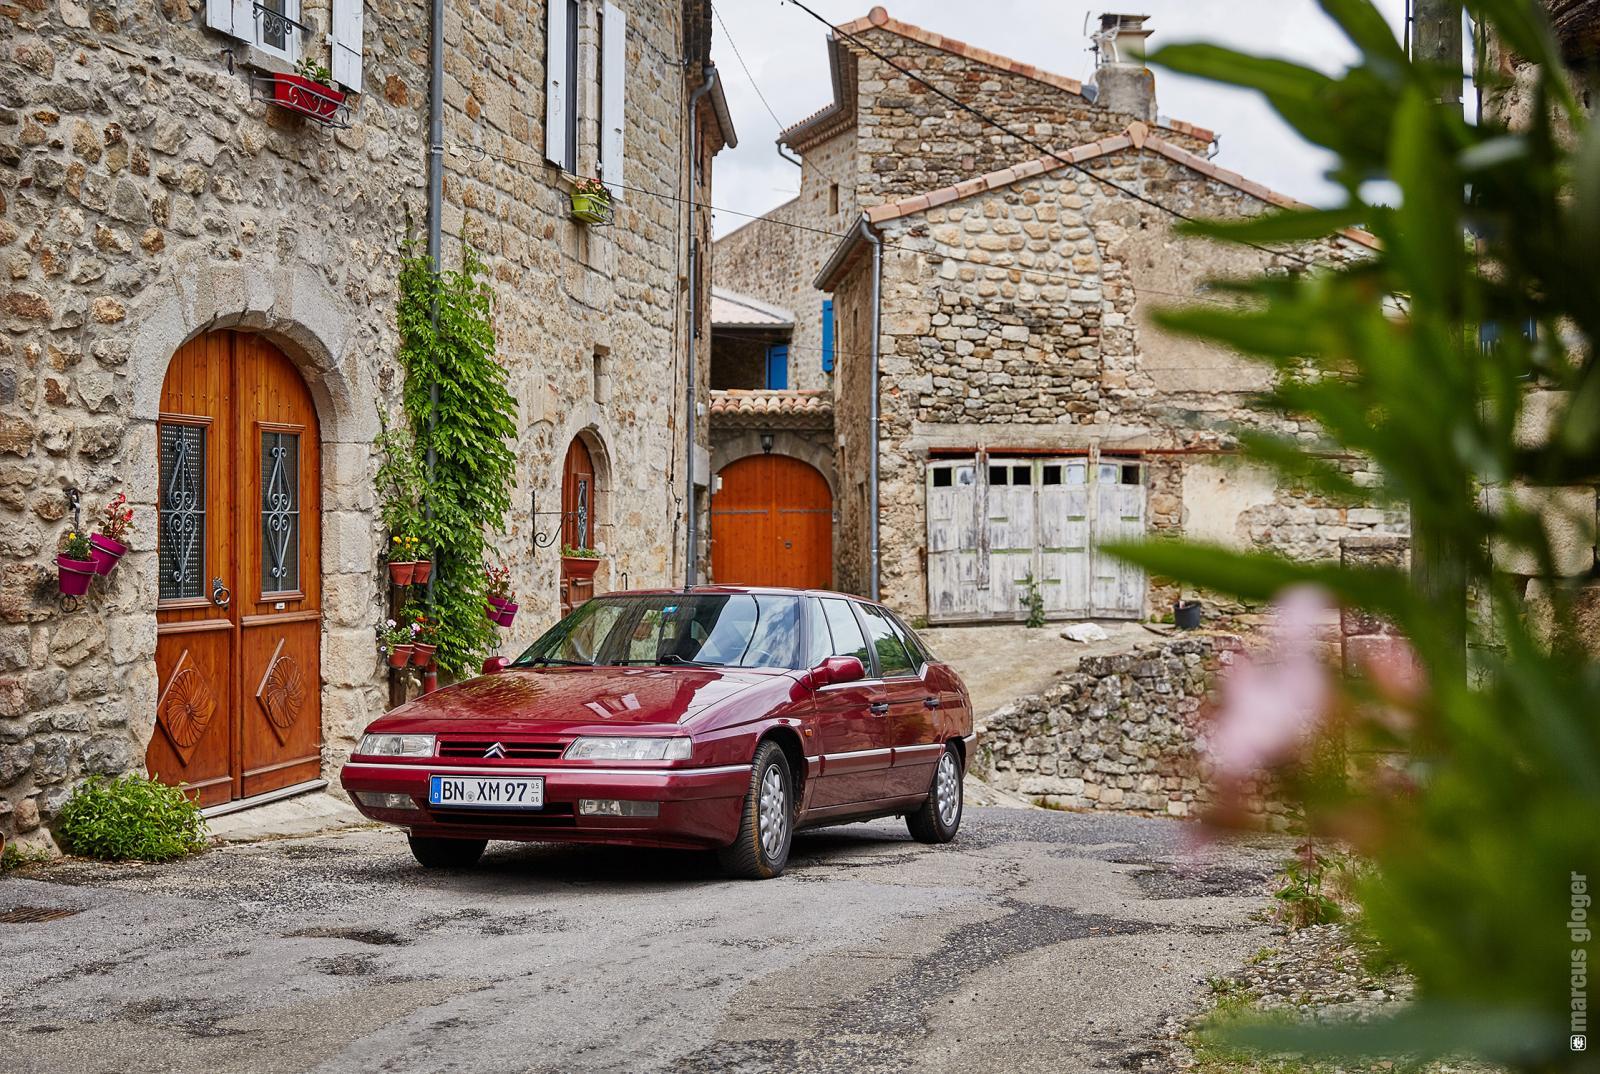 vinezac-GLO-9913a-mini.jpg